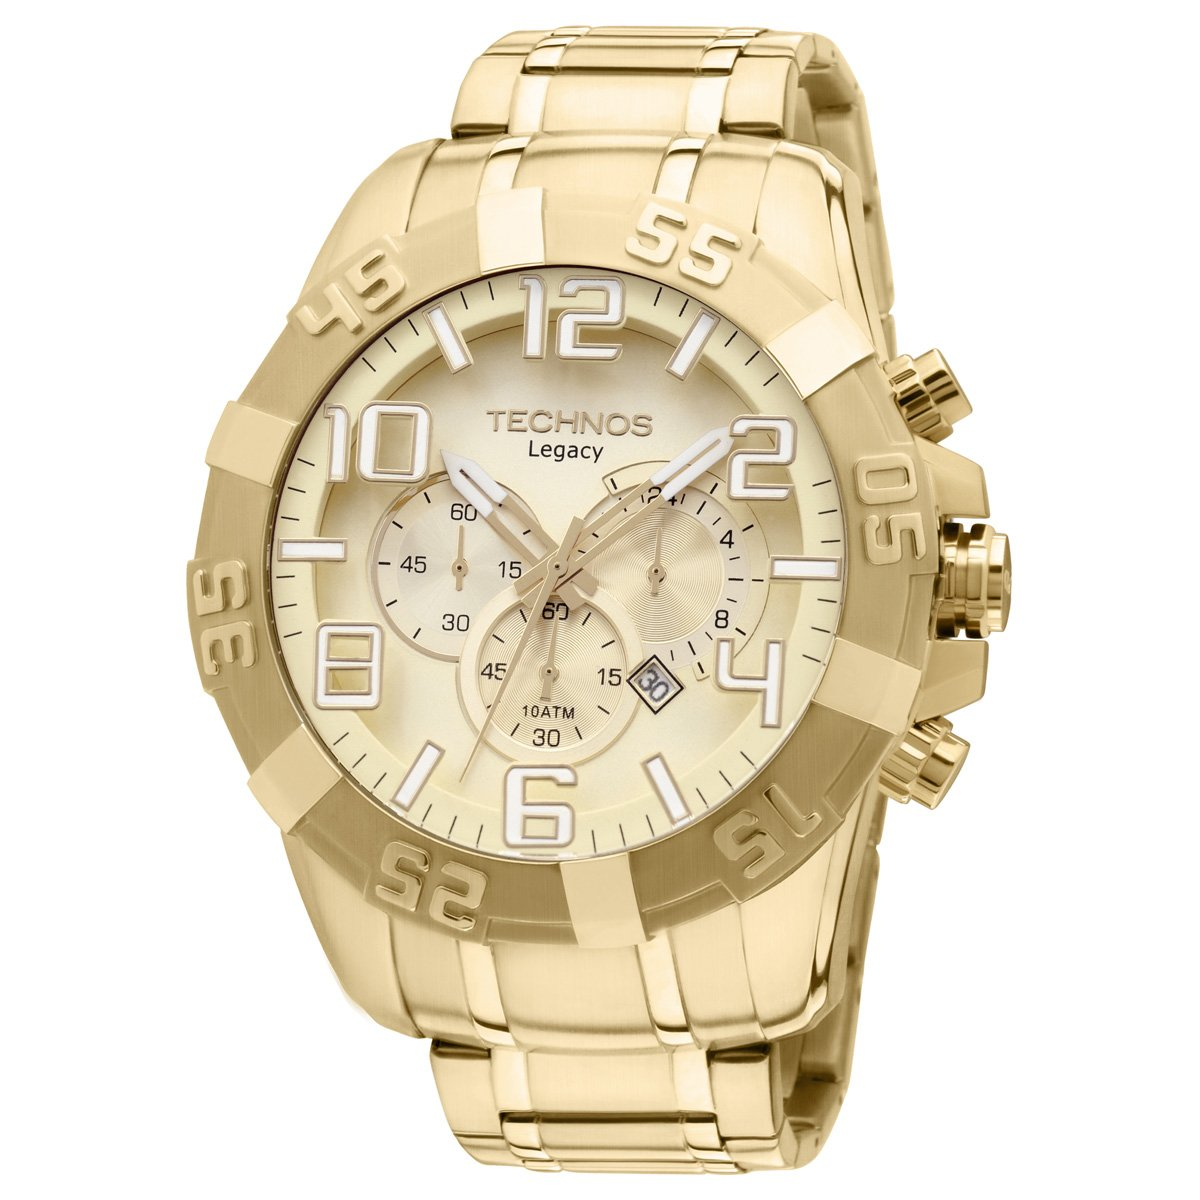 9fc491044e4 Relógio Technos Analógico - Dourado - Compre Agora